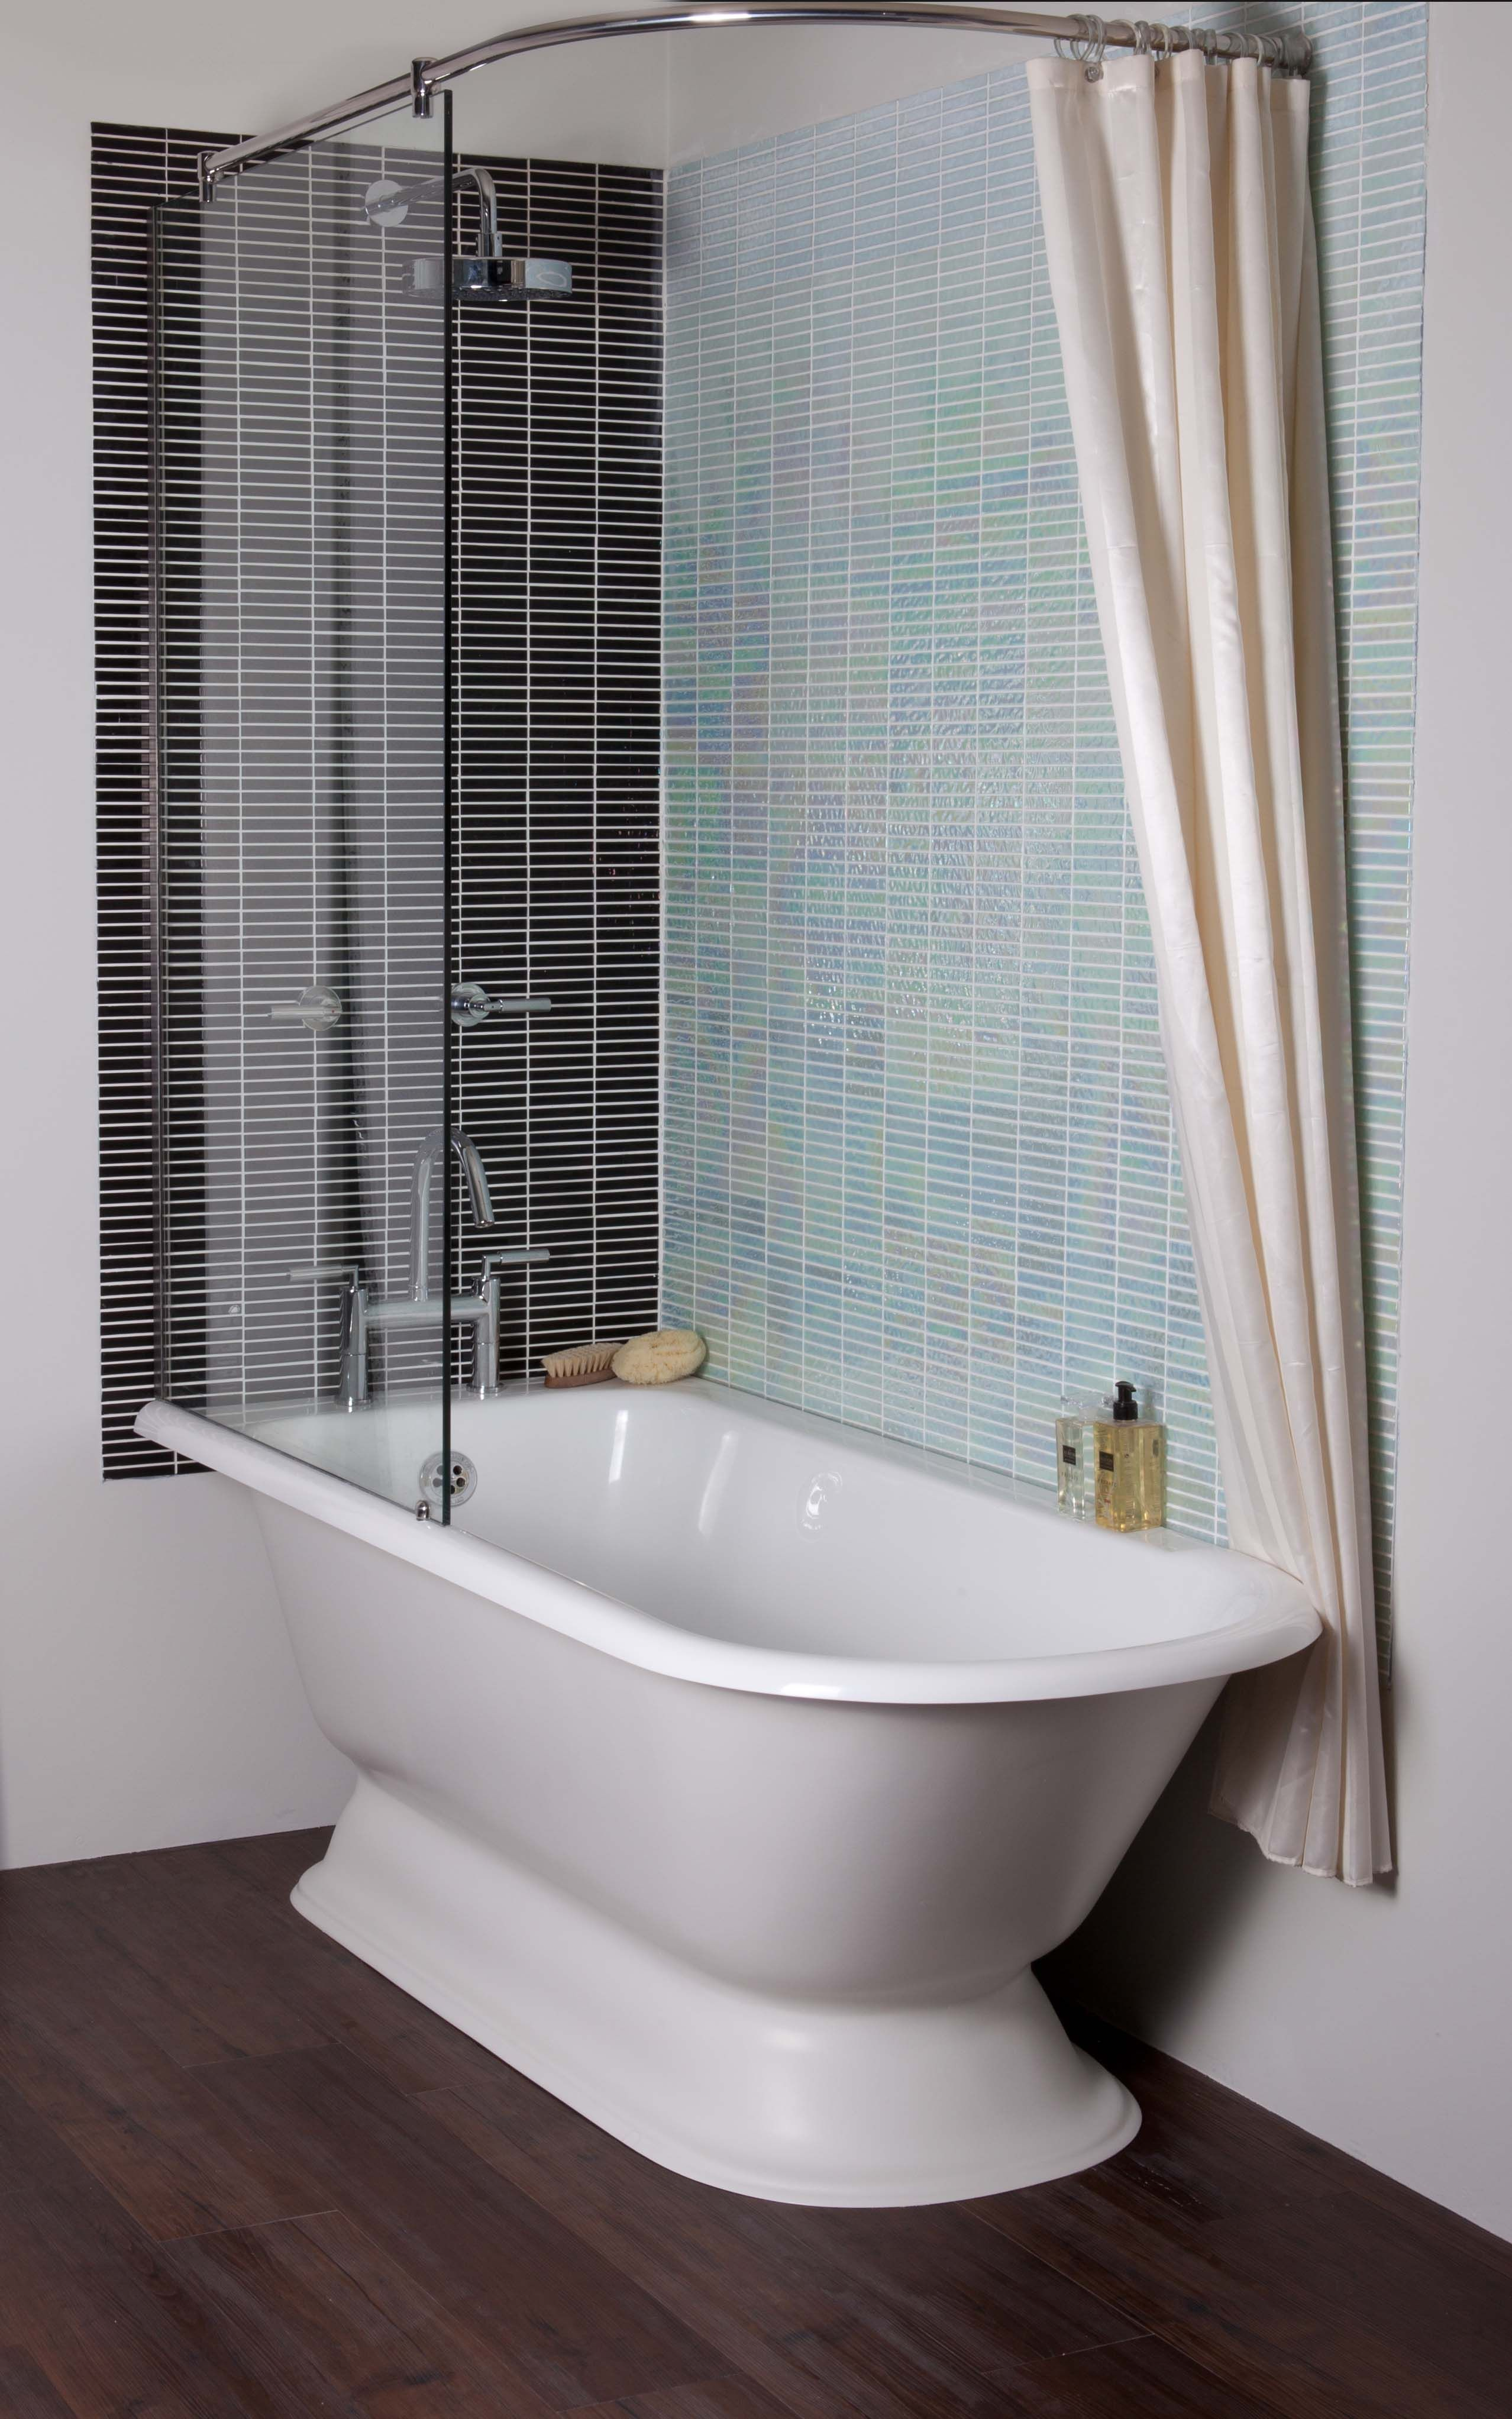 Bathroom Draque Acrylic Beautiful Free Standing Tub Shower Curtain Master Bathroom Features An